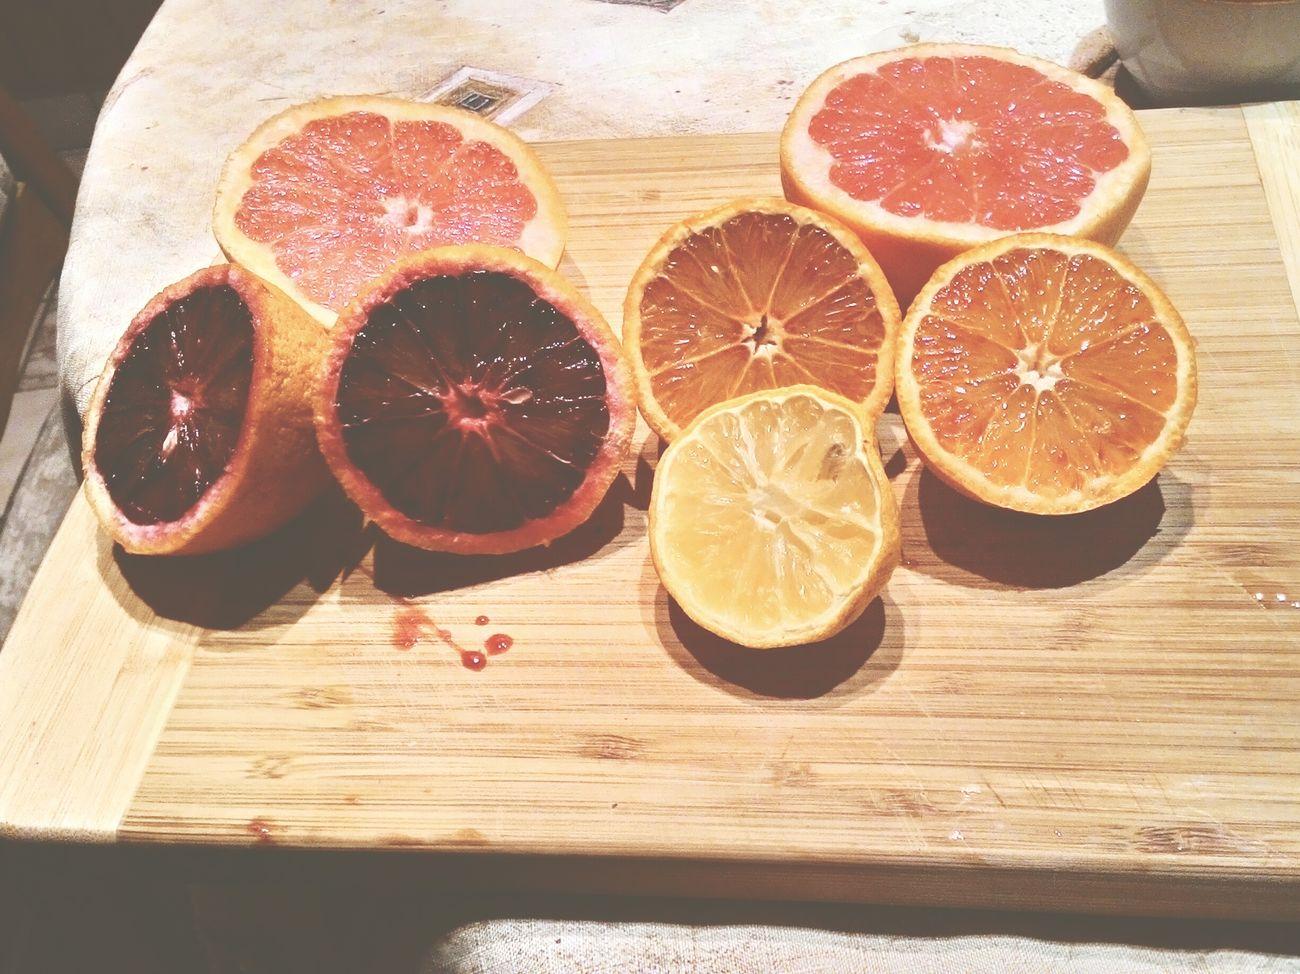 Sok cytrusowy z rana. Na kaca ideolo. CitrusFruitdrinks Orangejuice Bloodyorange Yummy♡ Foodporn Hangover Tgis Today(: Enjoy Kac